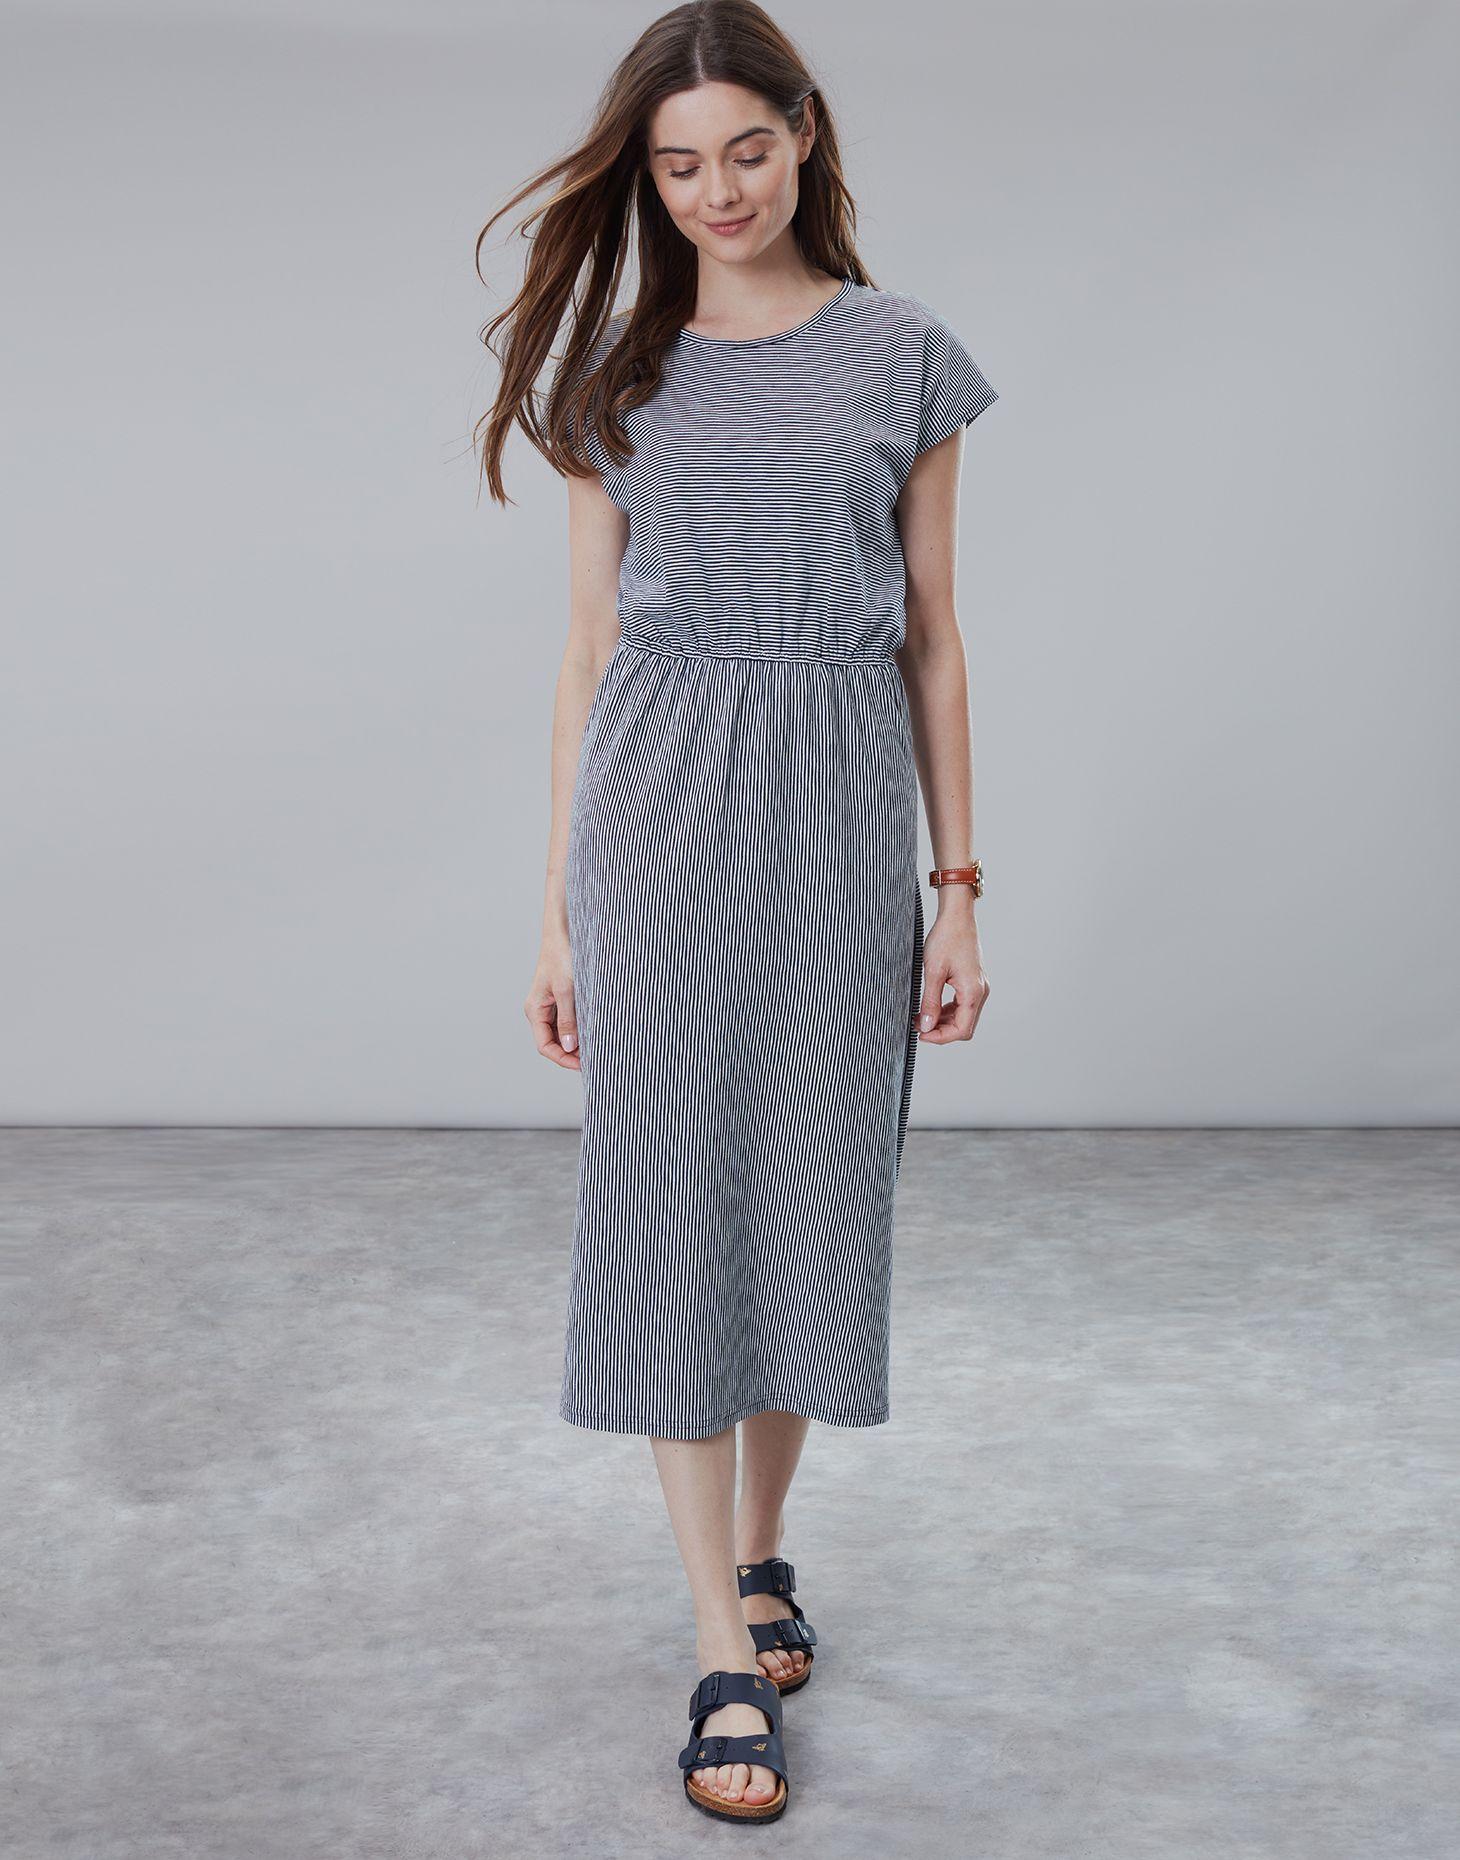 Alma Navy Cream Stripe Jersey Midi Dress Joules Uk Dresses Striped Jersey Dress Midi Dress